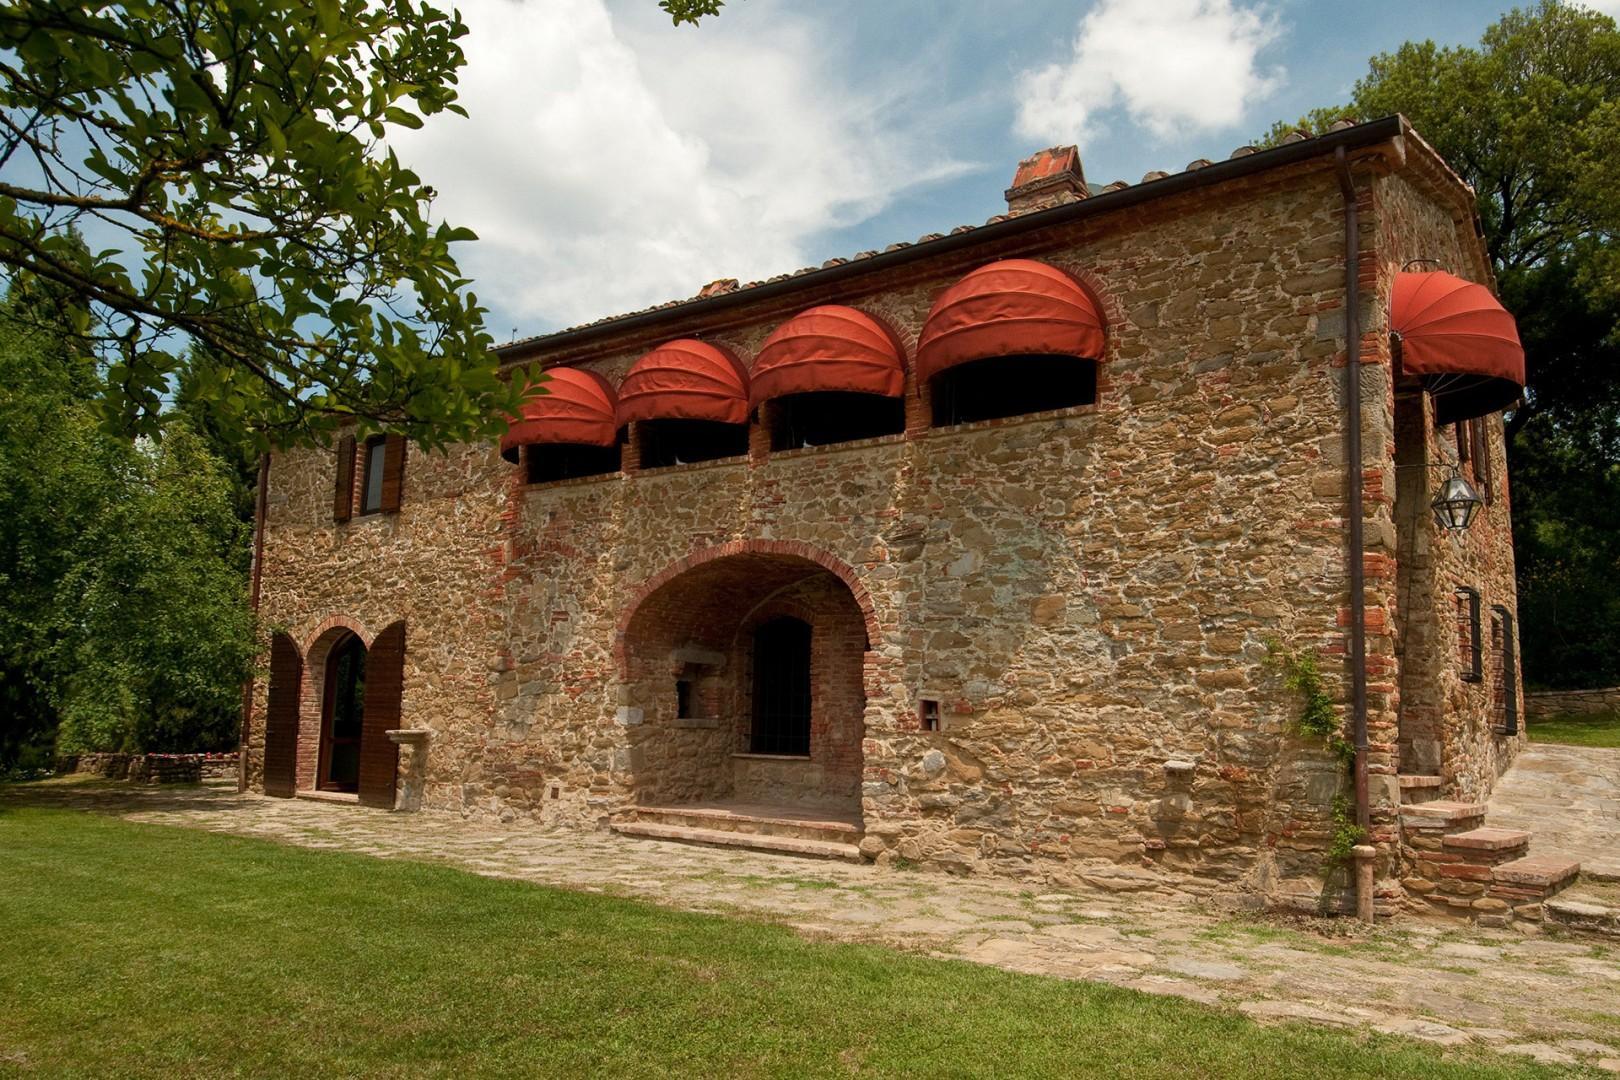 L' Albero Bello villa is situated in the gorgeous Val d'Orcia, near Cortona.